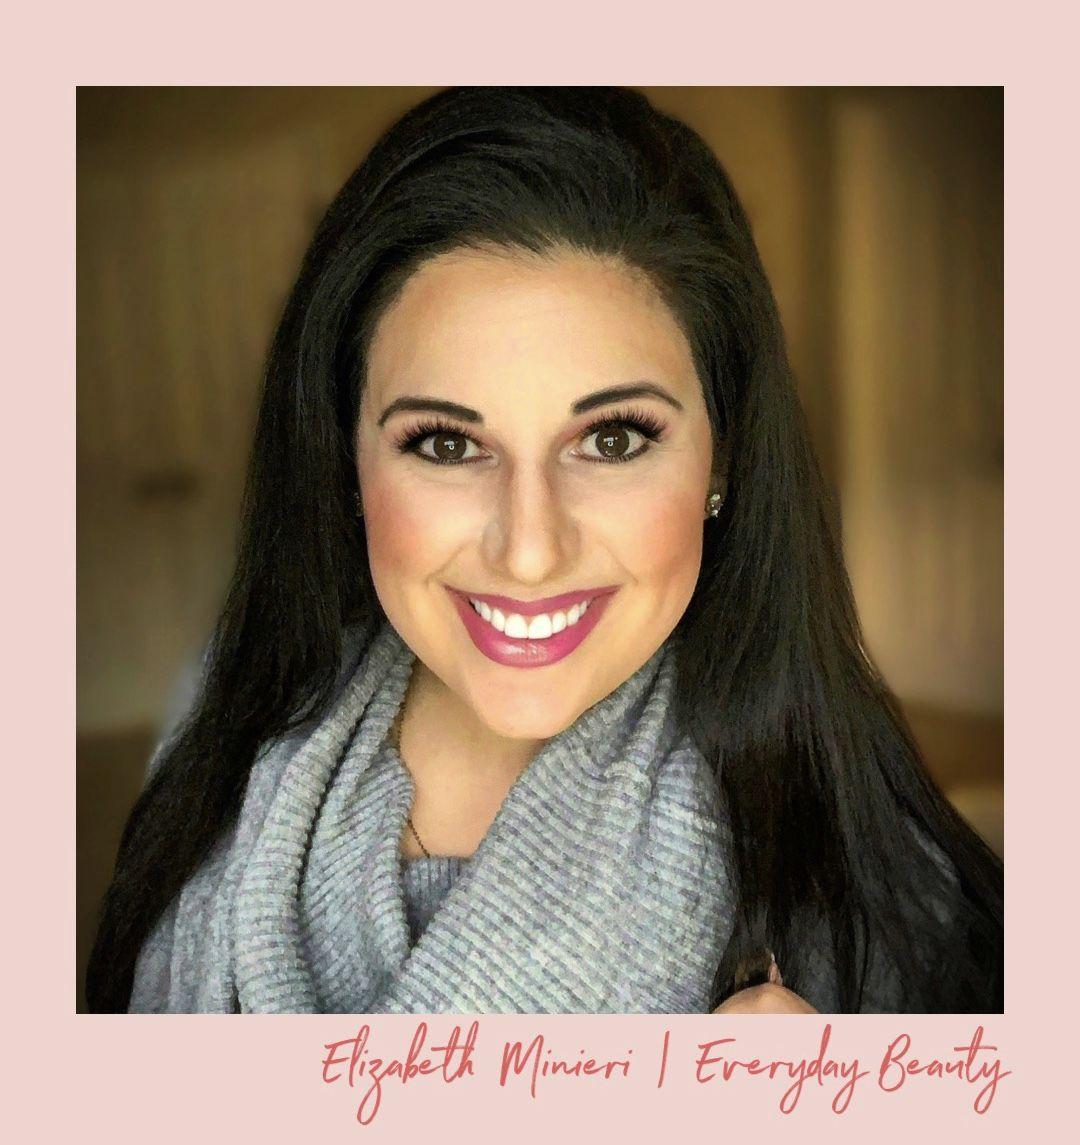 #makeup #mua #elizabethminieri #fallmakeup #makeuplooks #beautyblogger #younique